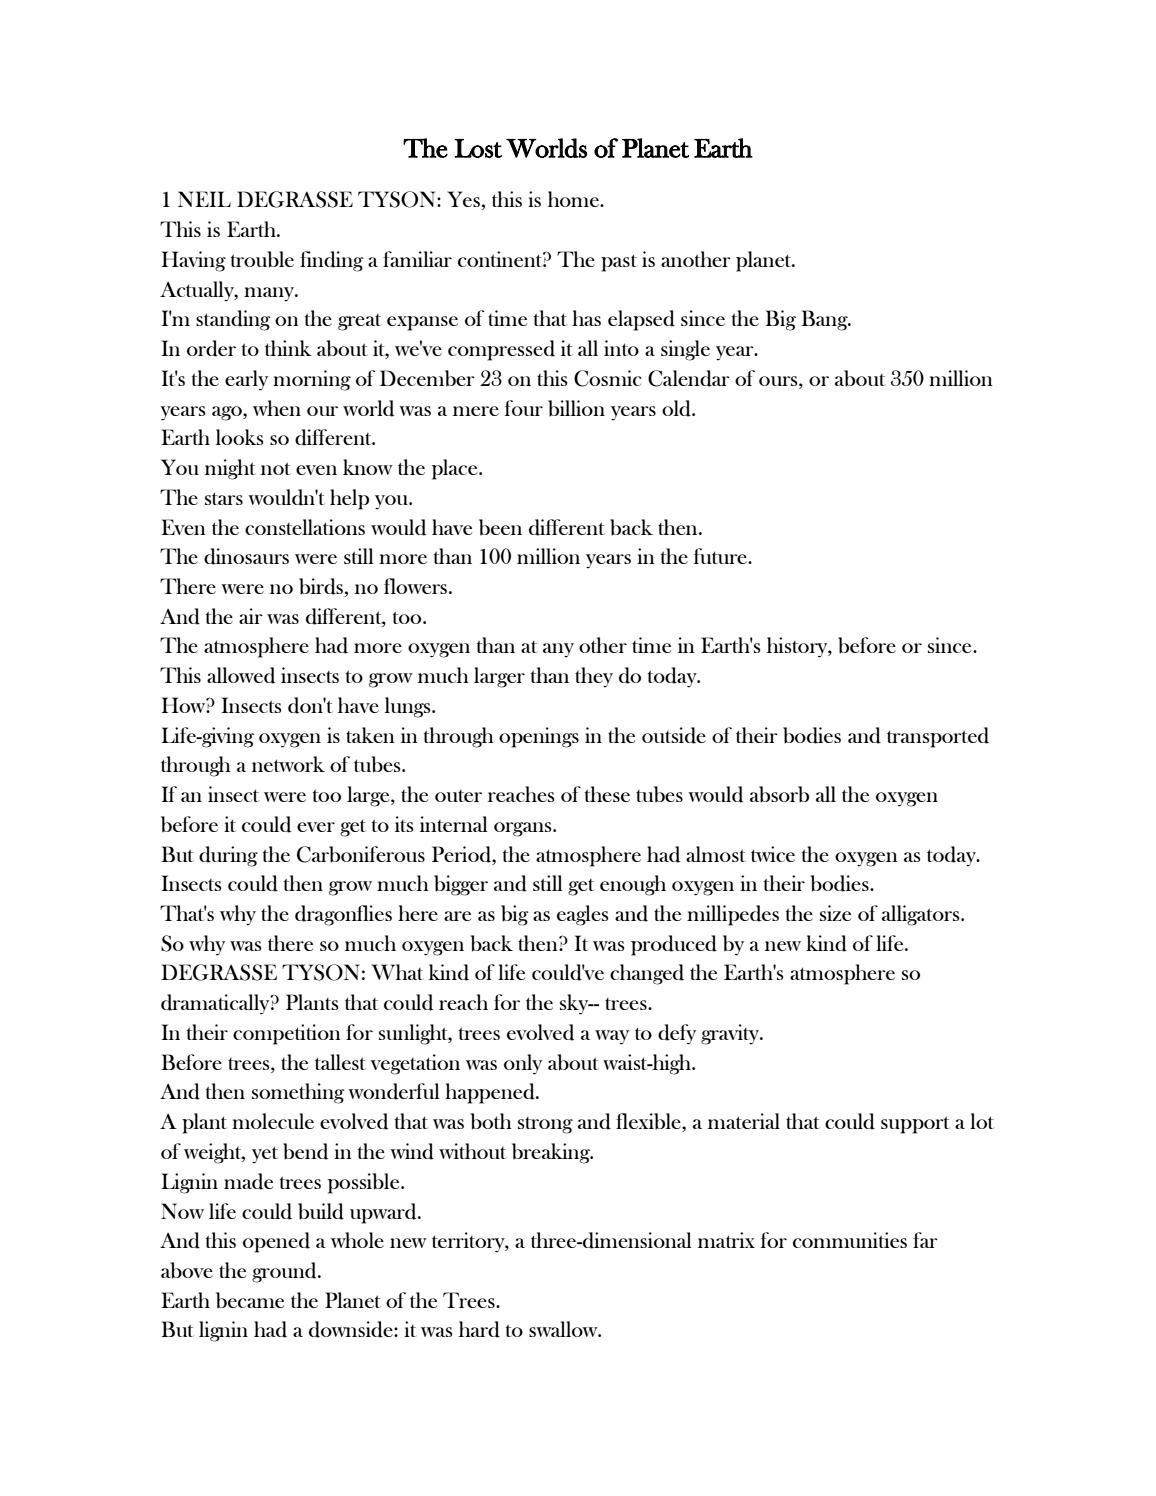 Planet Earth Freshwater Worksheet top Ten Floo Y Wong Artist — Planet Earth 2 Worksheets Pdf